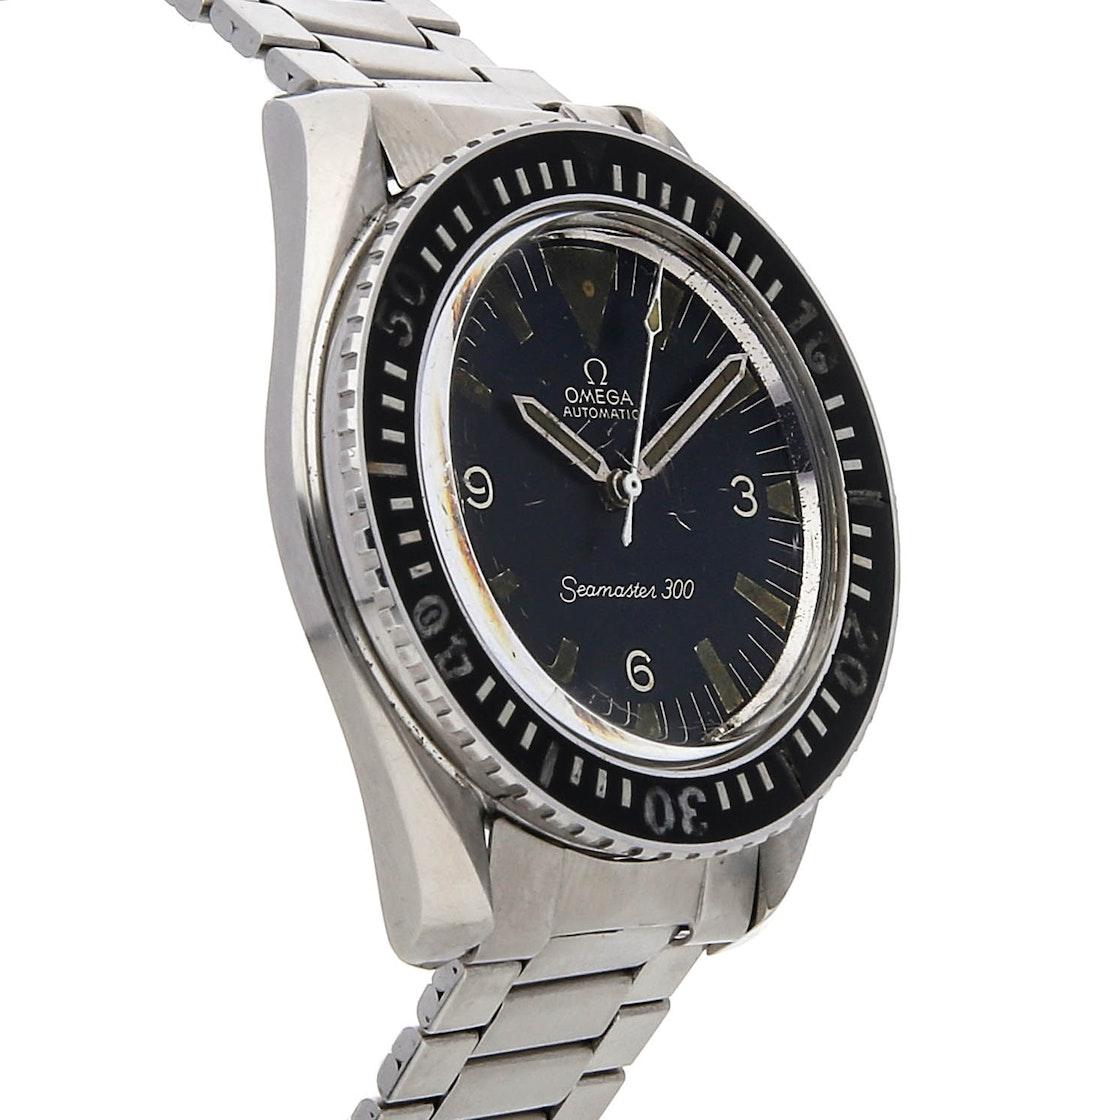 Omega Vintage Seamaster 300m 165.024